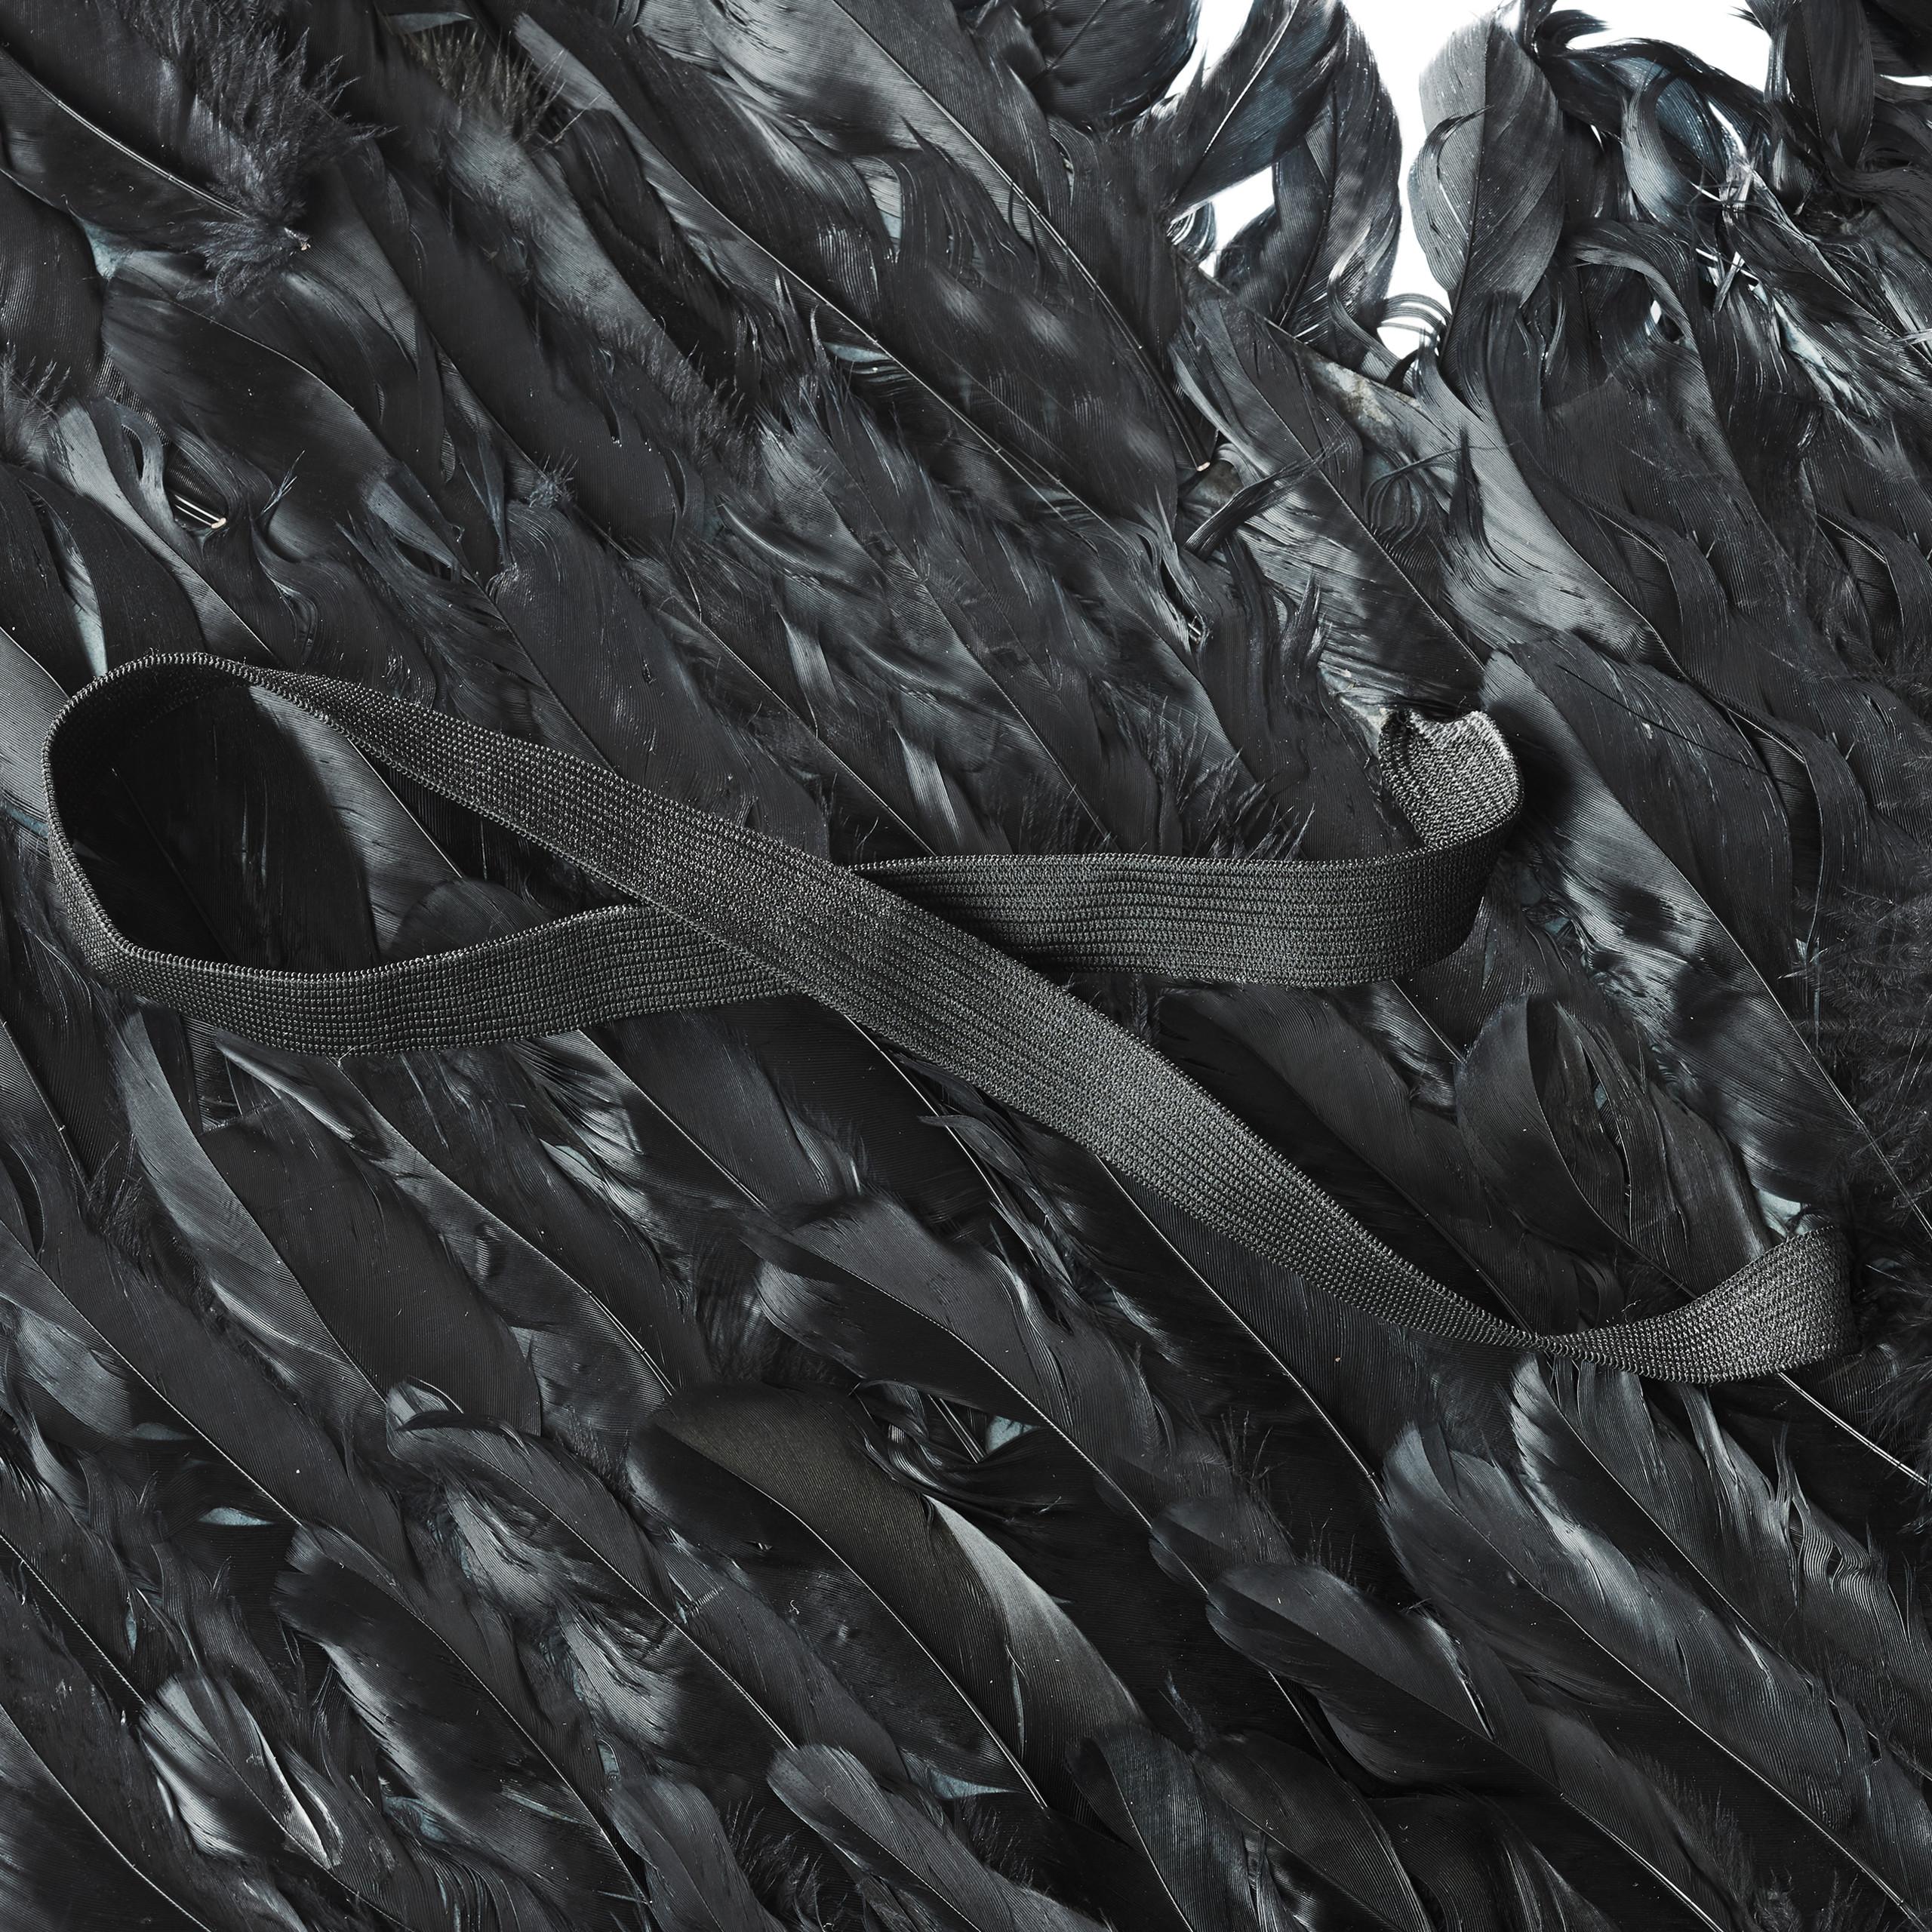 vleugels-verkleedkleding-XXL-engelenvleugels-engelkostuum-kunstveren miniatuur 14